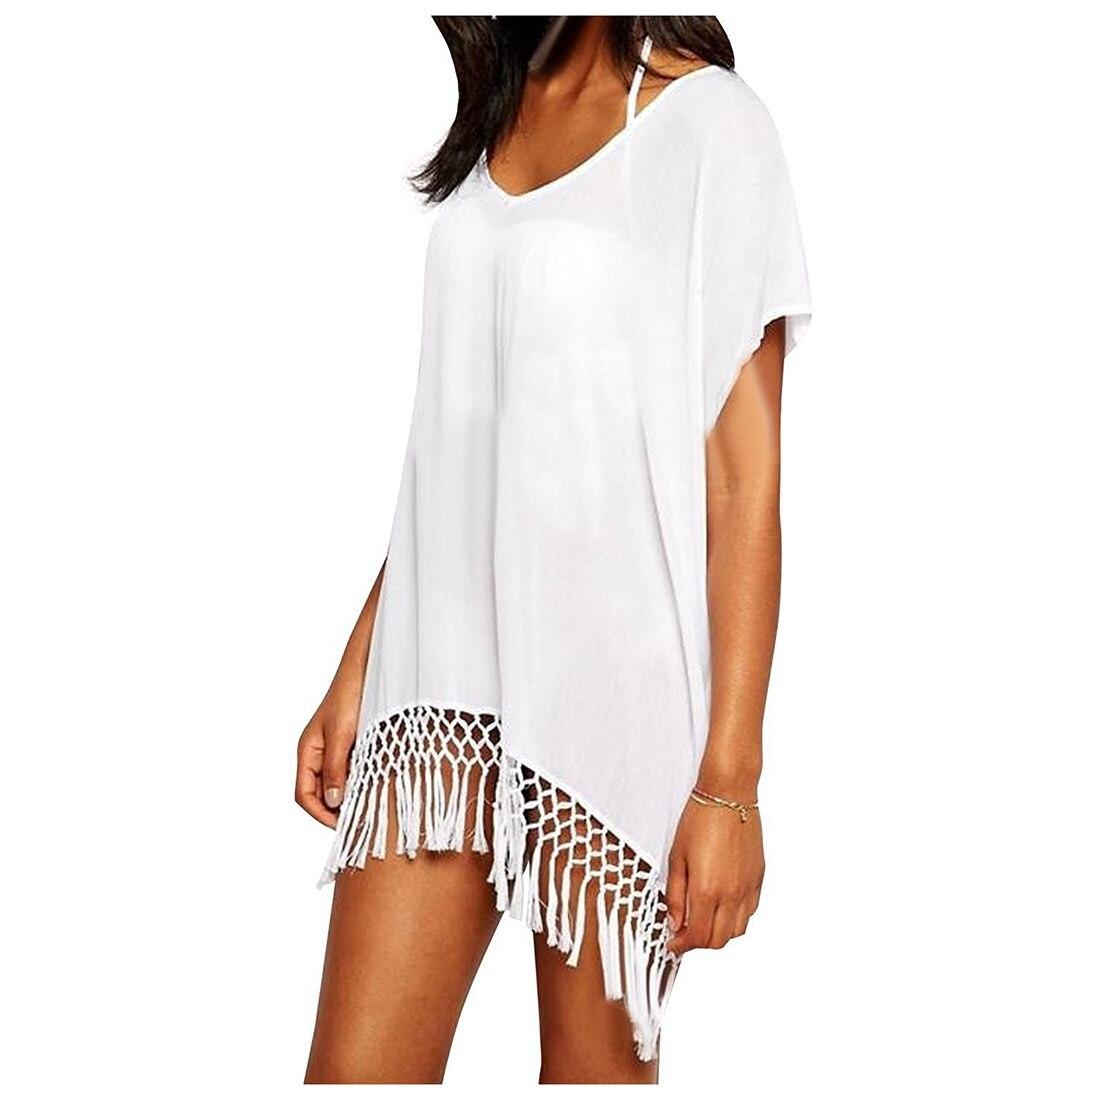 Wholesale! Womens Tassel Oversized Beach Cover Up Swimsuit Bathing Suit Beach Dress White